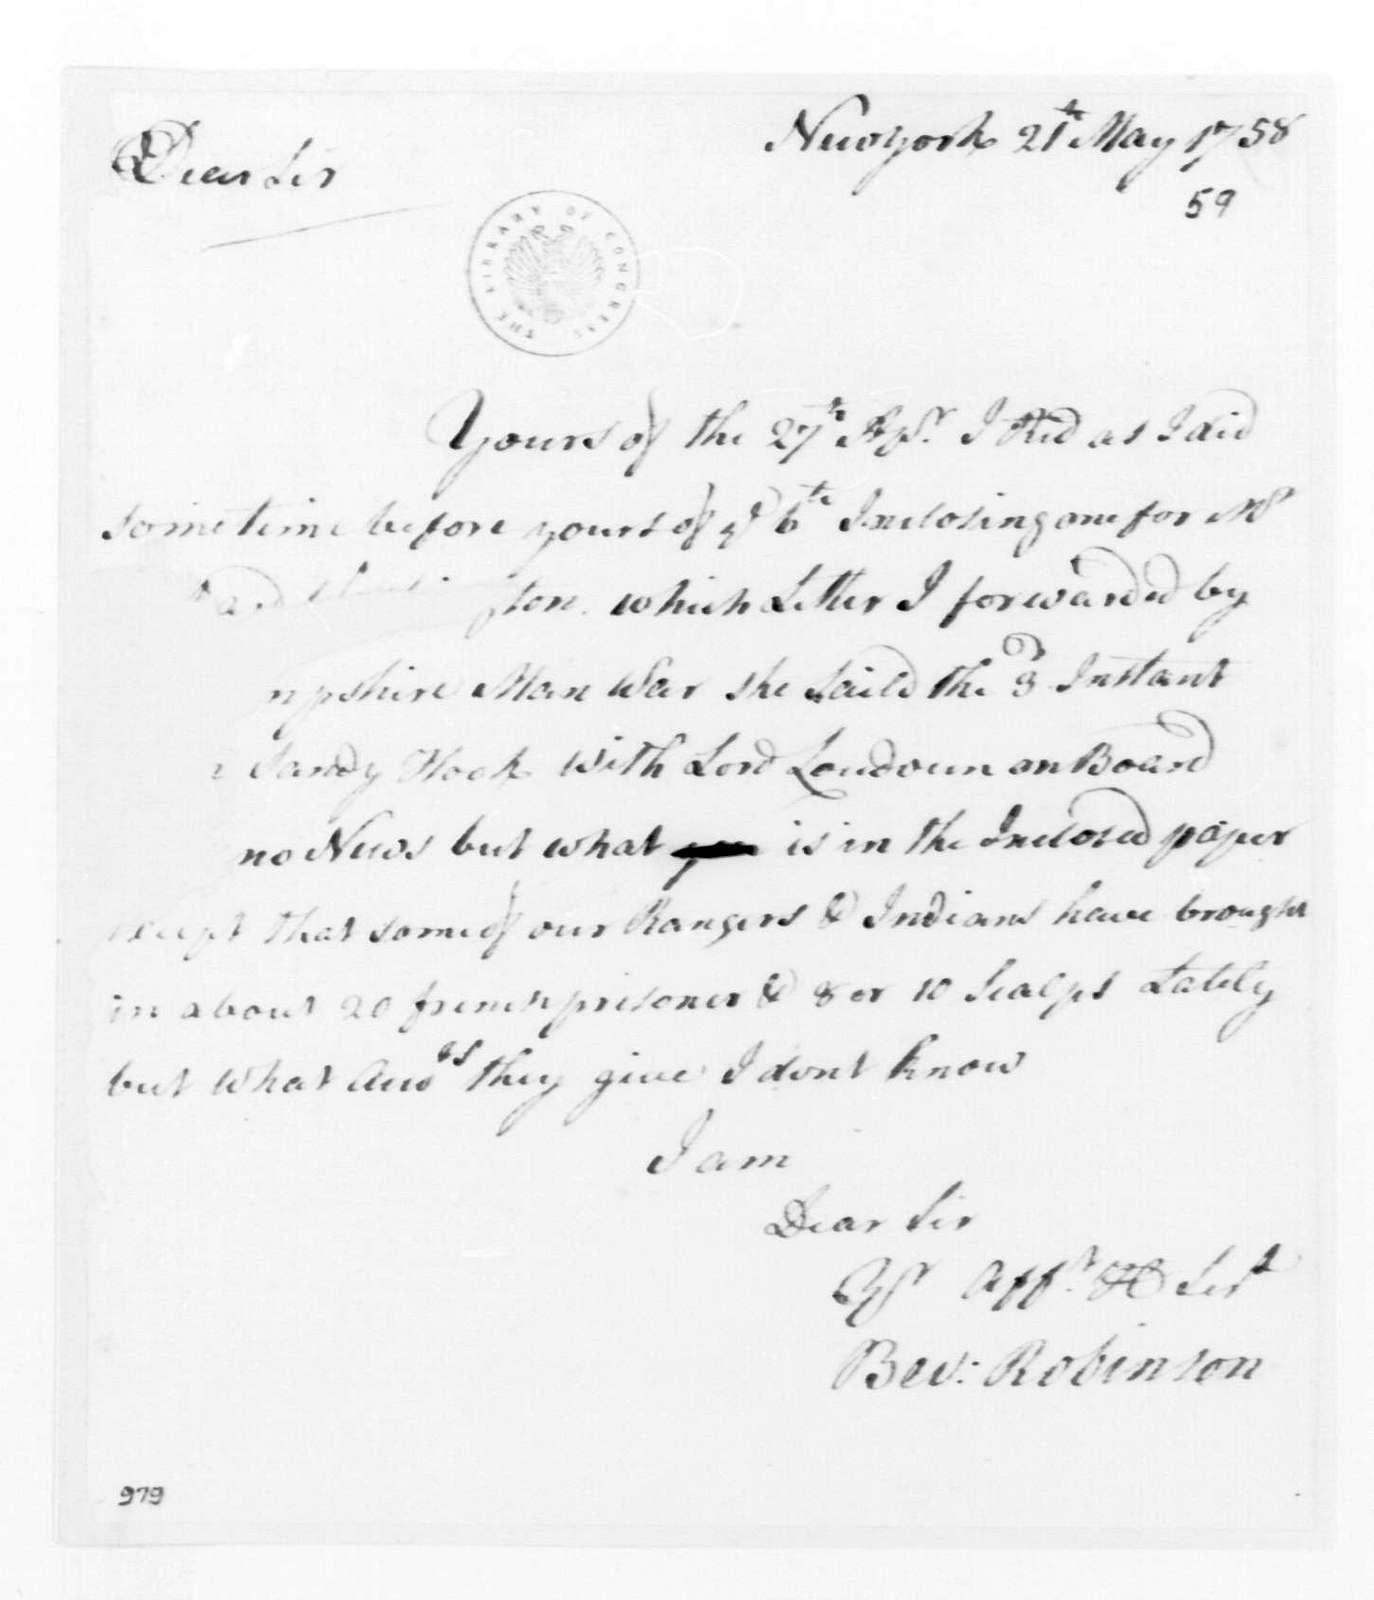 George Washington Papers, Series 4, General Correspondence: Beverley Robinson to George Washington, May 21, 1758